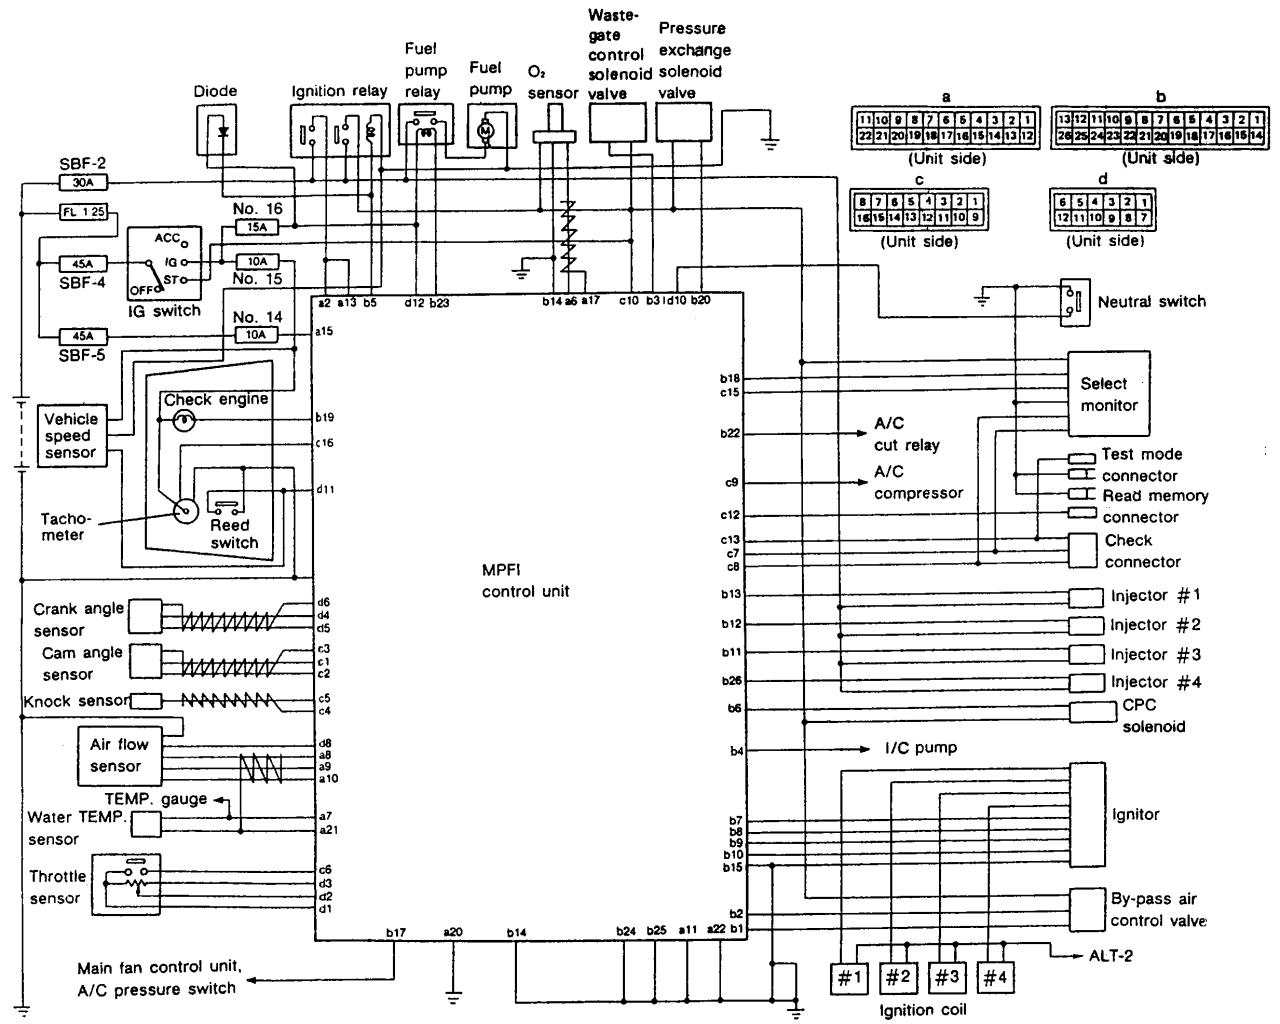 2013 subaru outback stereo wiring diagram 2006 subaru legacy wiring diagram e1 wiring diagram  2006 subaru legacy wiring diagram e1